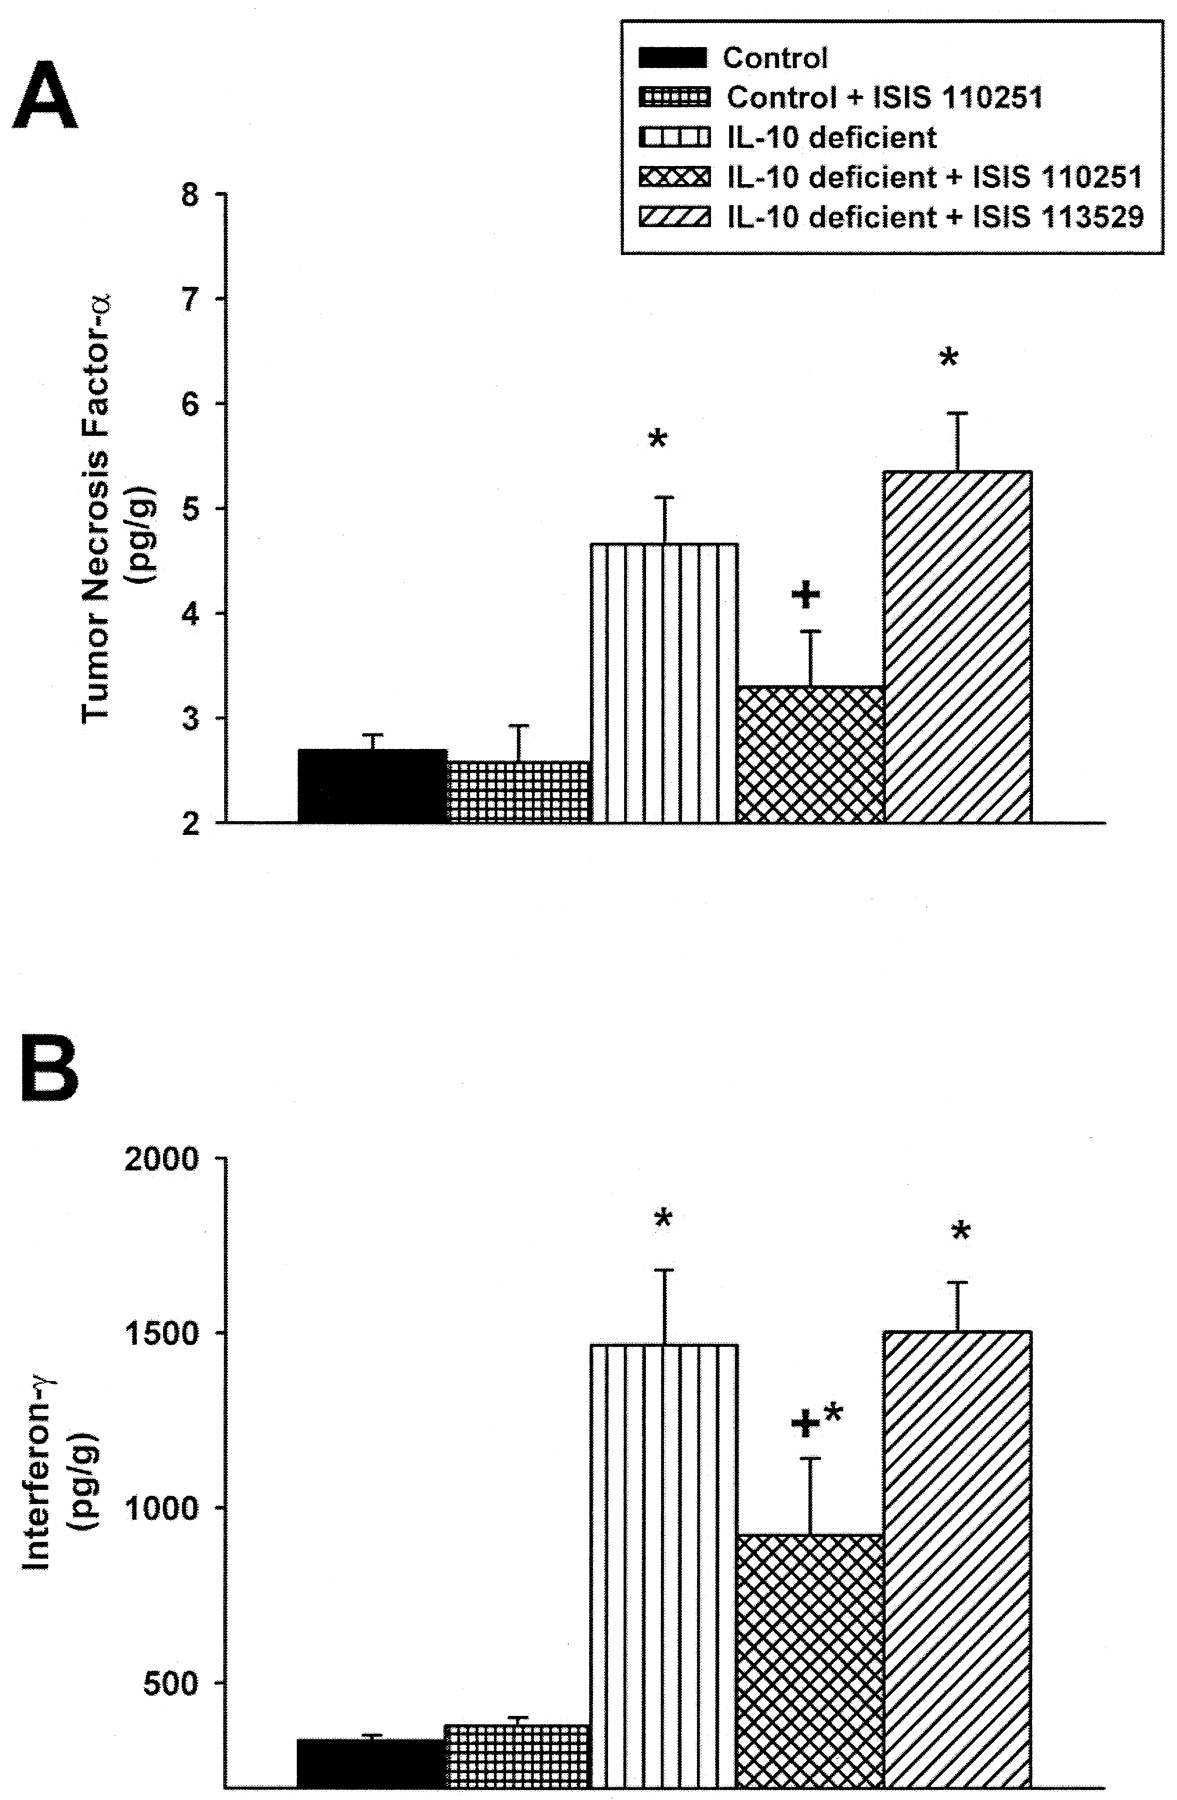 Antisense Oligonucleotides To Polyadp Ribose Polymerase 2 American Standard Heritage 10 Heat Pump Wiring Diagram Download Figure